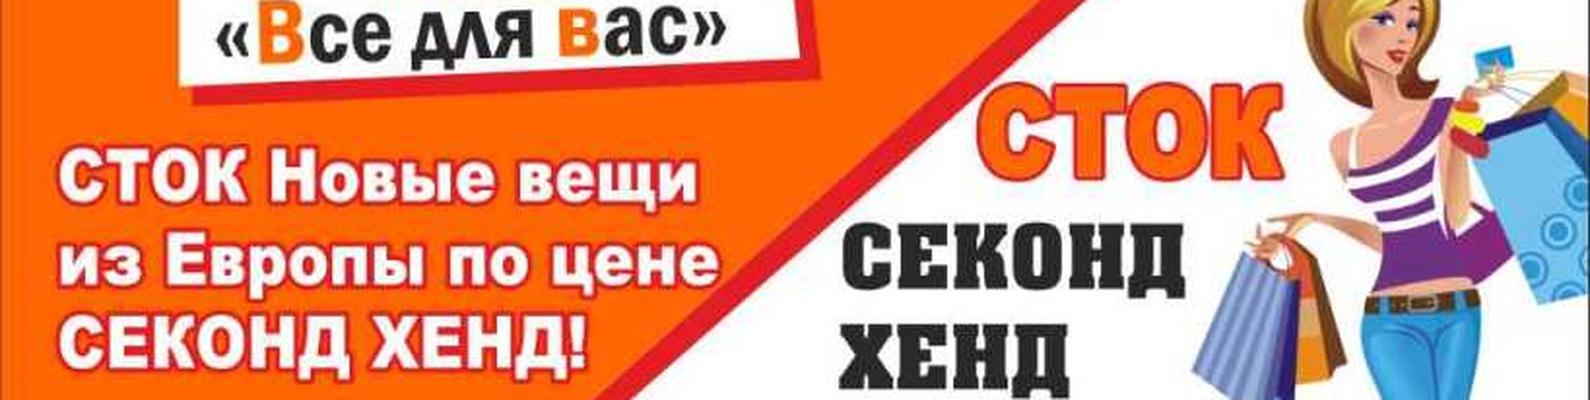 Сток и секонд хенд Павловска   ВКонтакте d5f21ca0d50